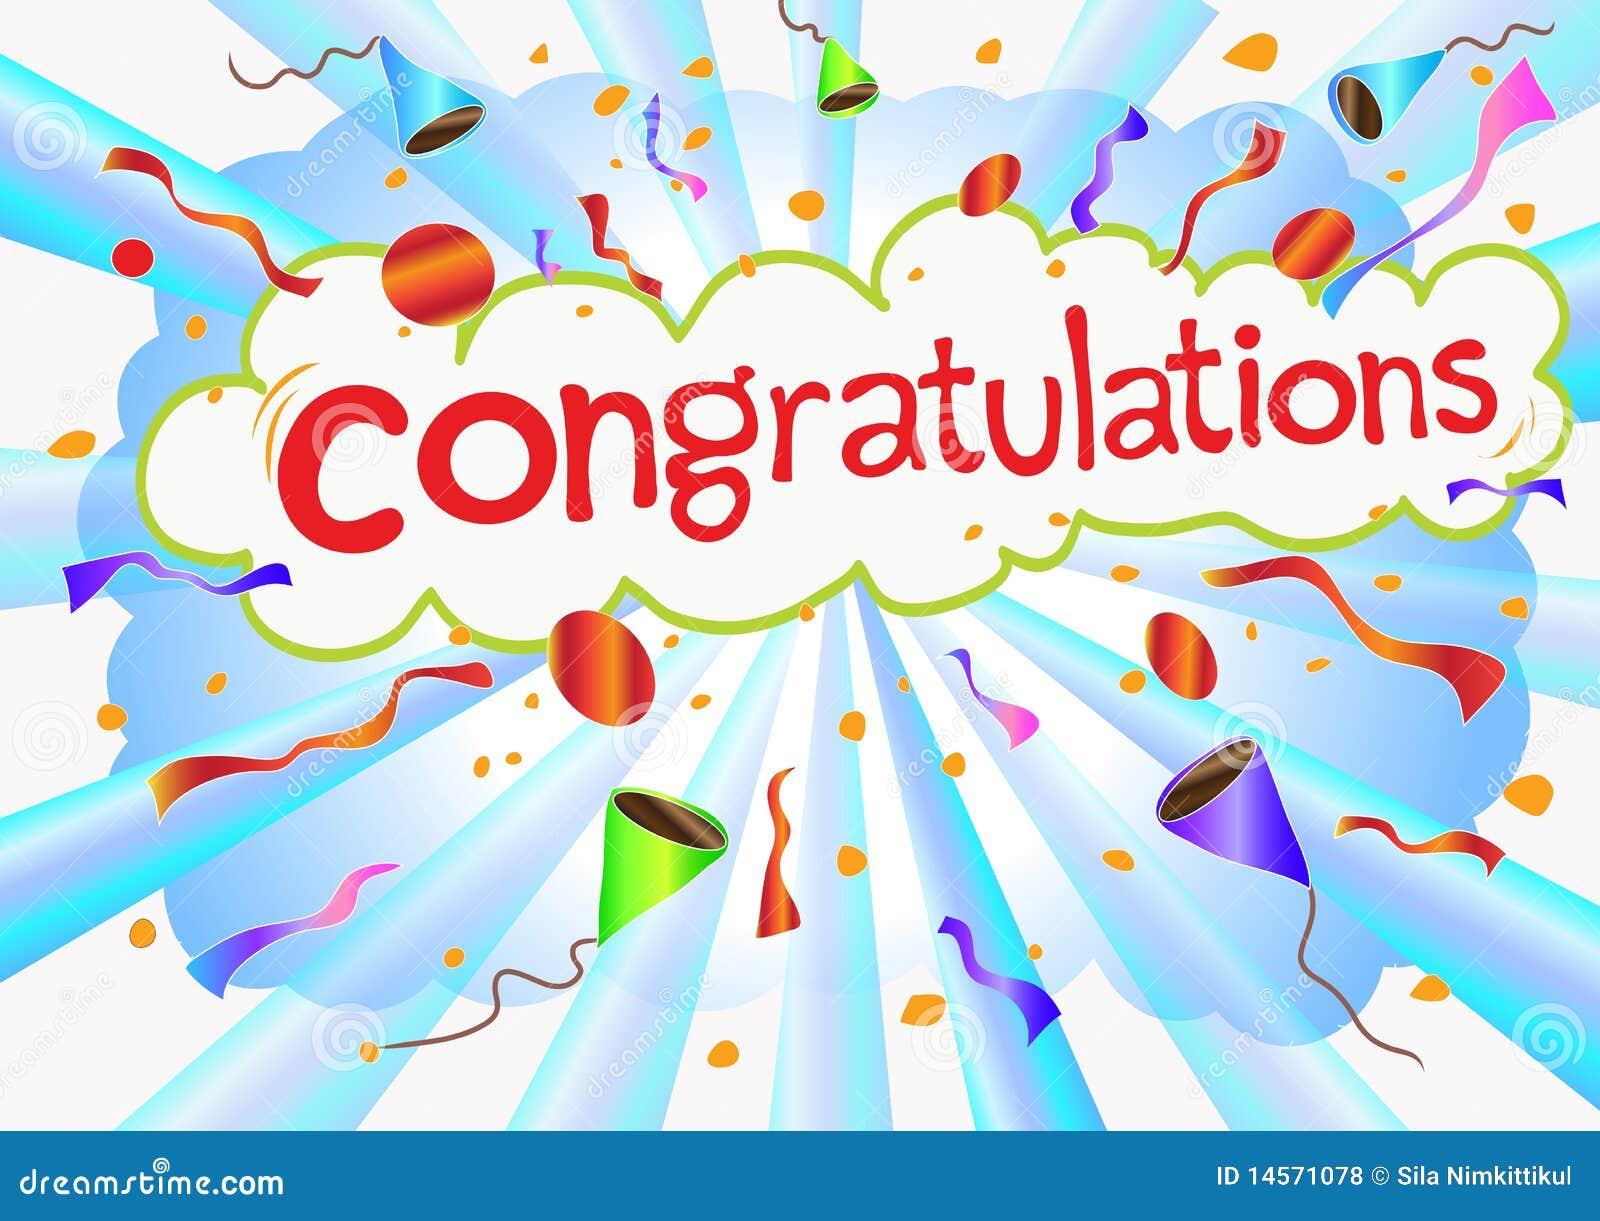 illustration congratulations wording and celebrati royalty